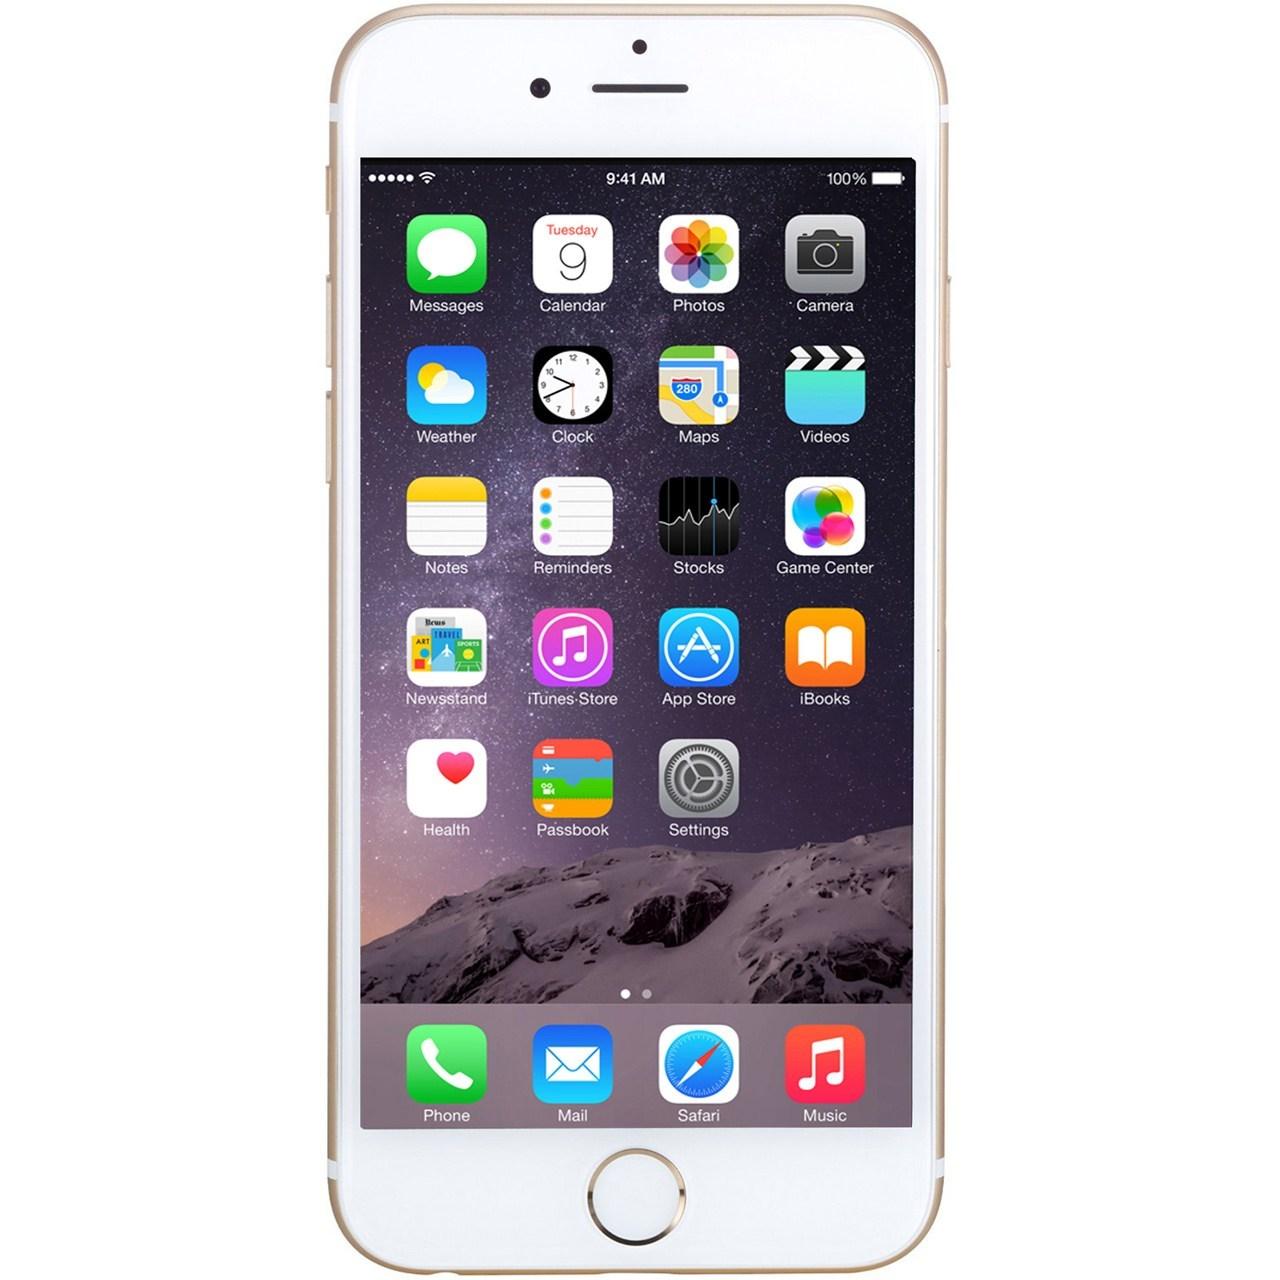 گوشی موبایل اپل آیفون 6 پلاس - 16 گیگابایت